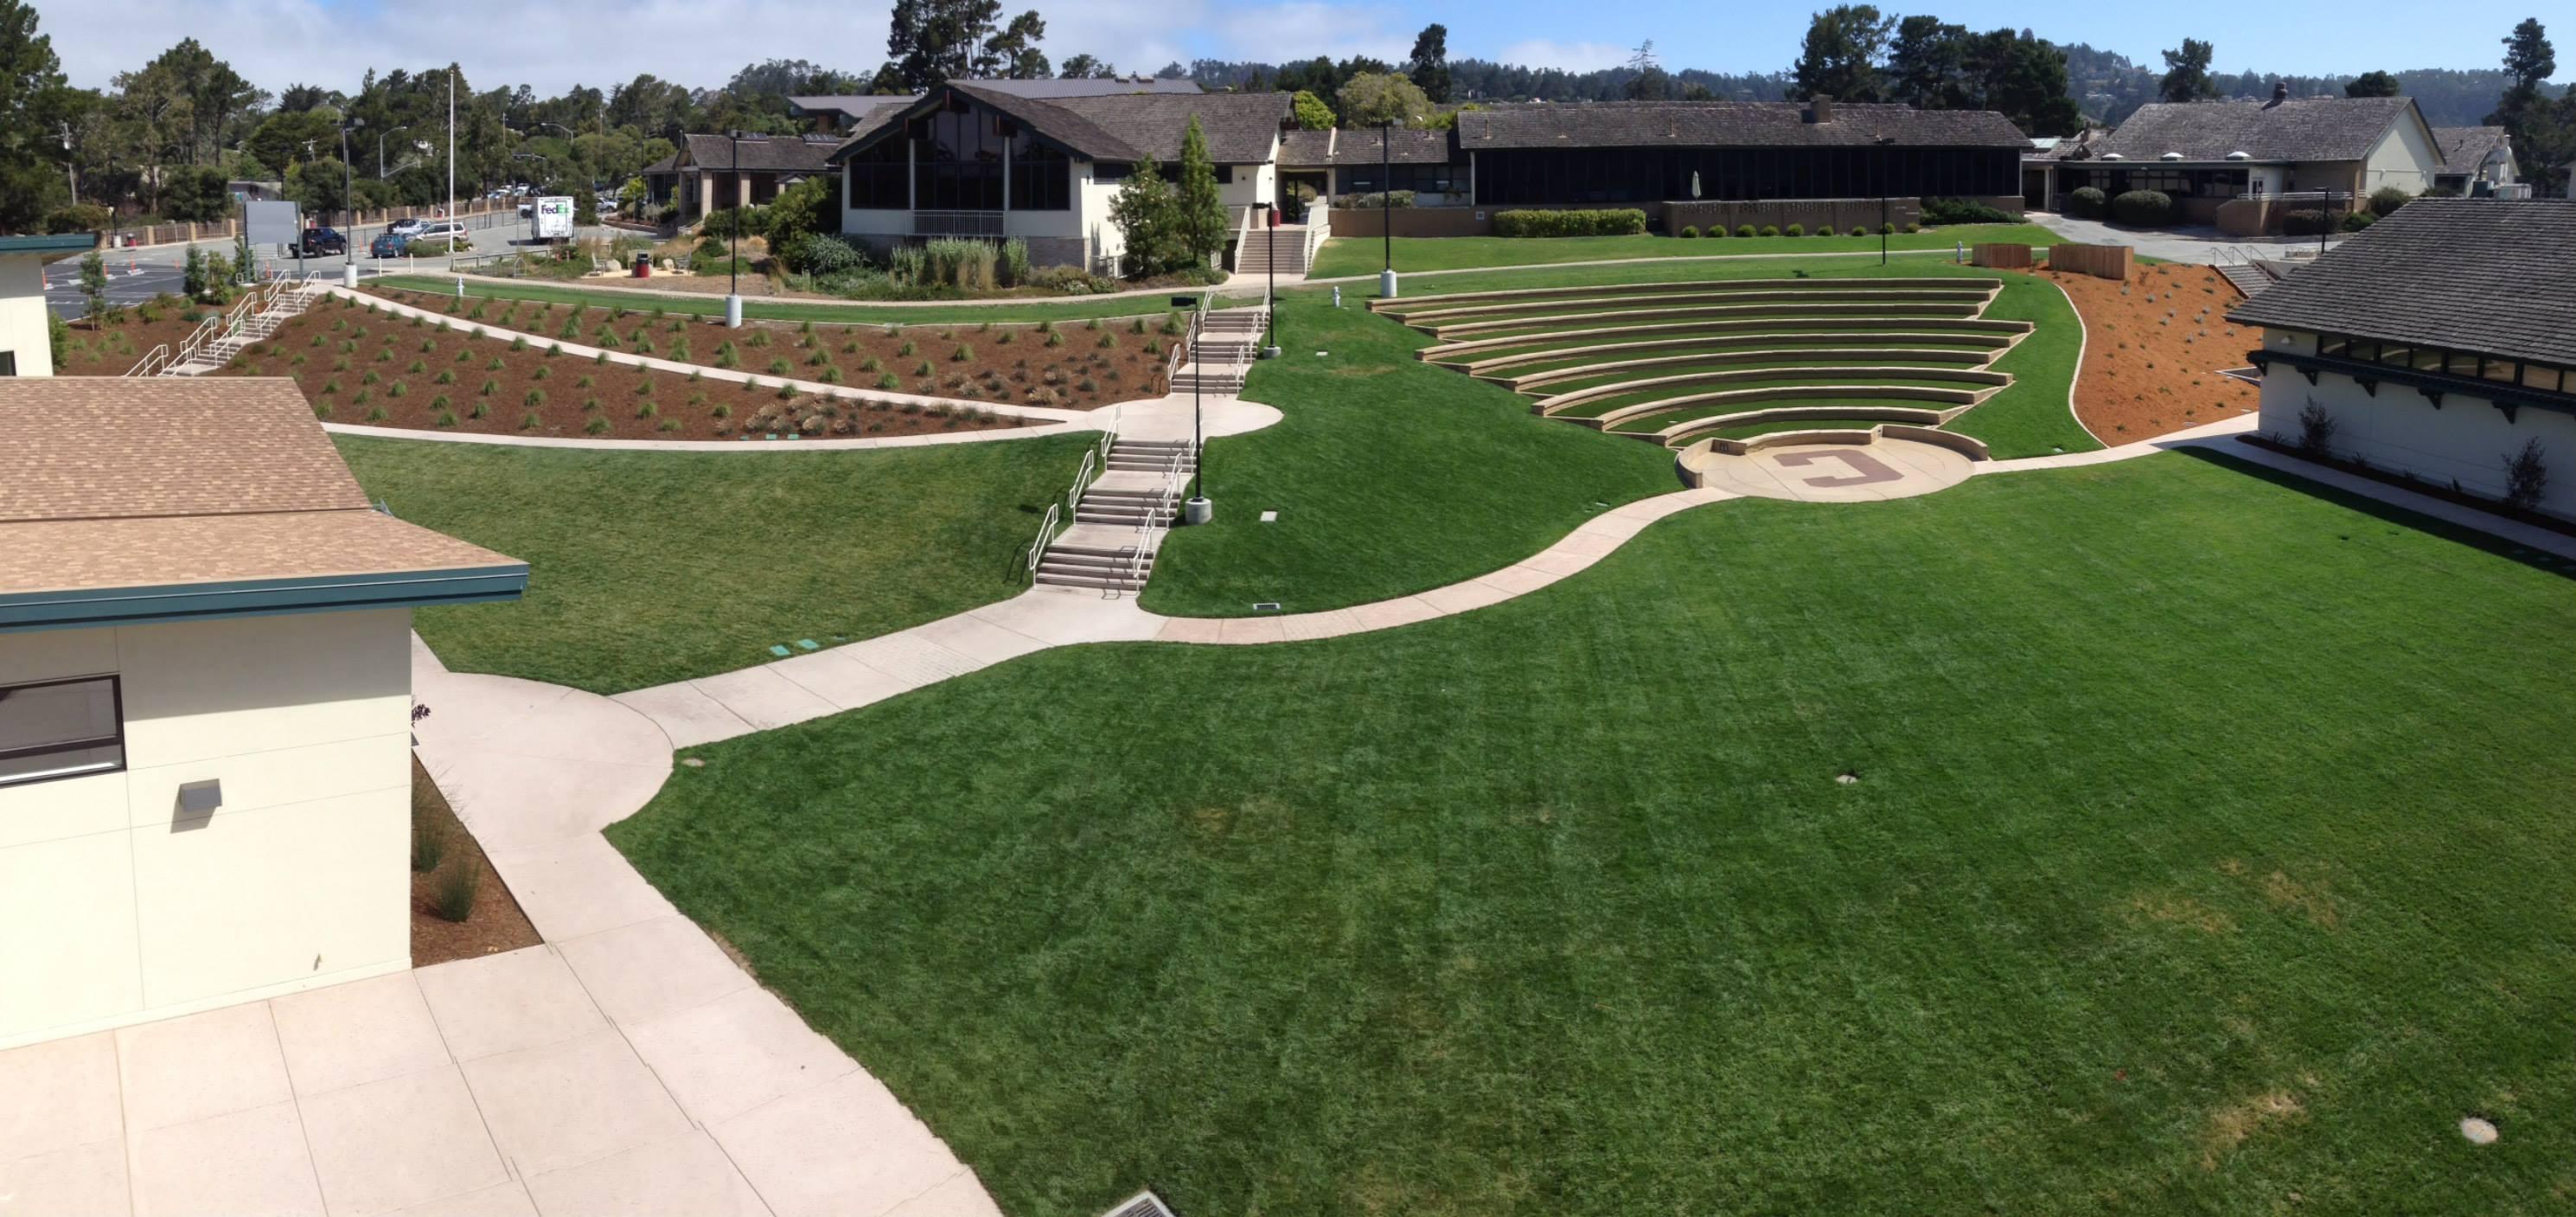 Carmel High School Amphitheatre Xtreme Green Synthetic Turf